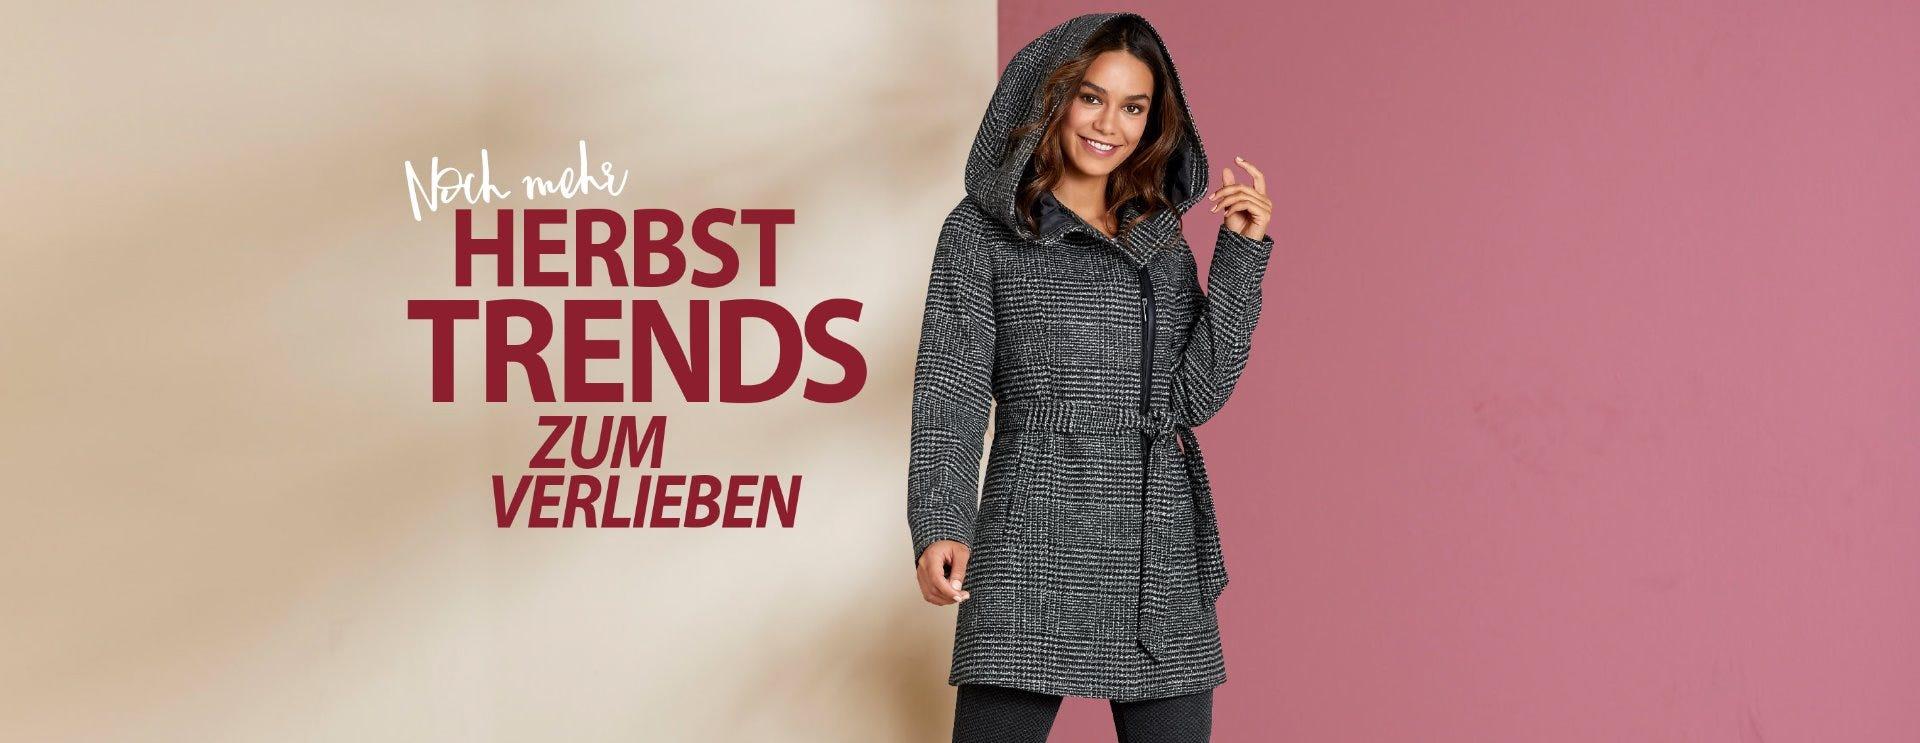 huge discount 8dbf1 def45 Online shoppen bei NKD | Staunen, sparen, schöner leben | NKD